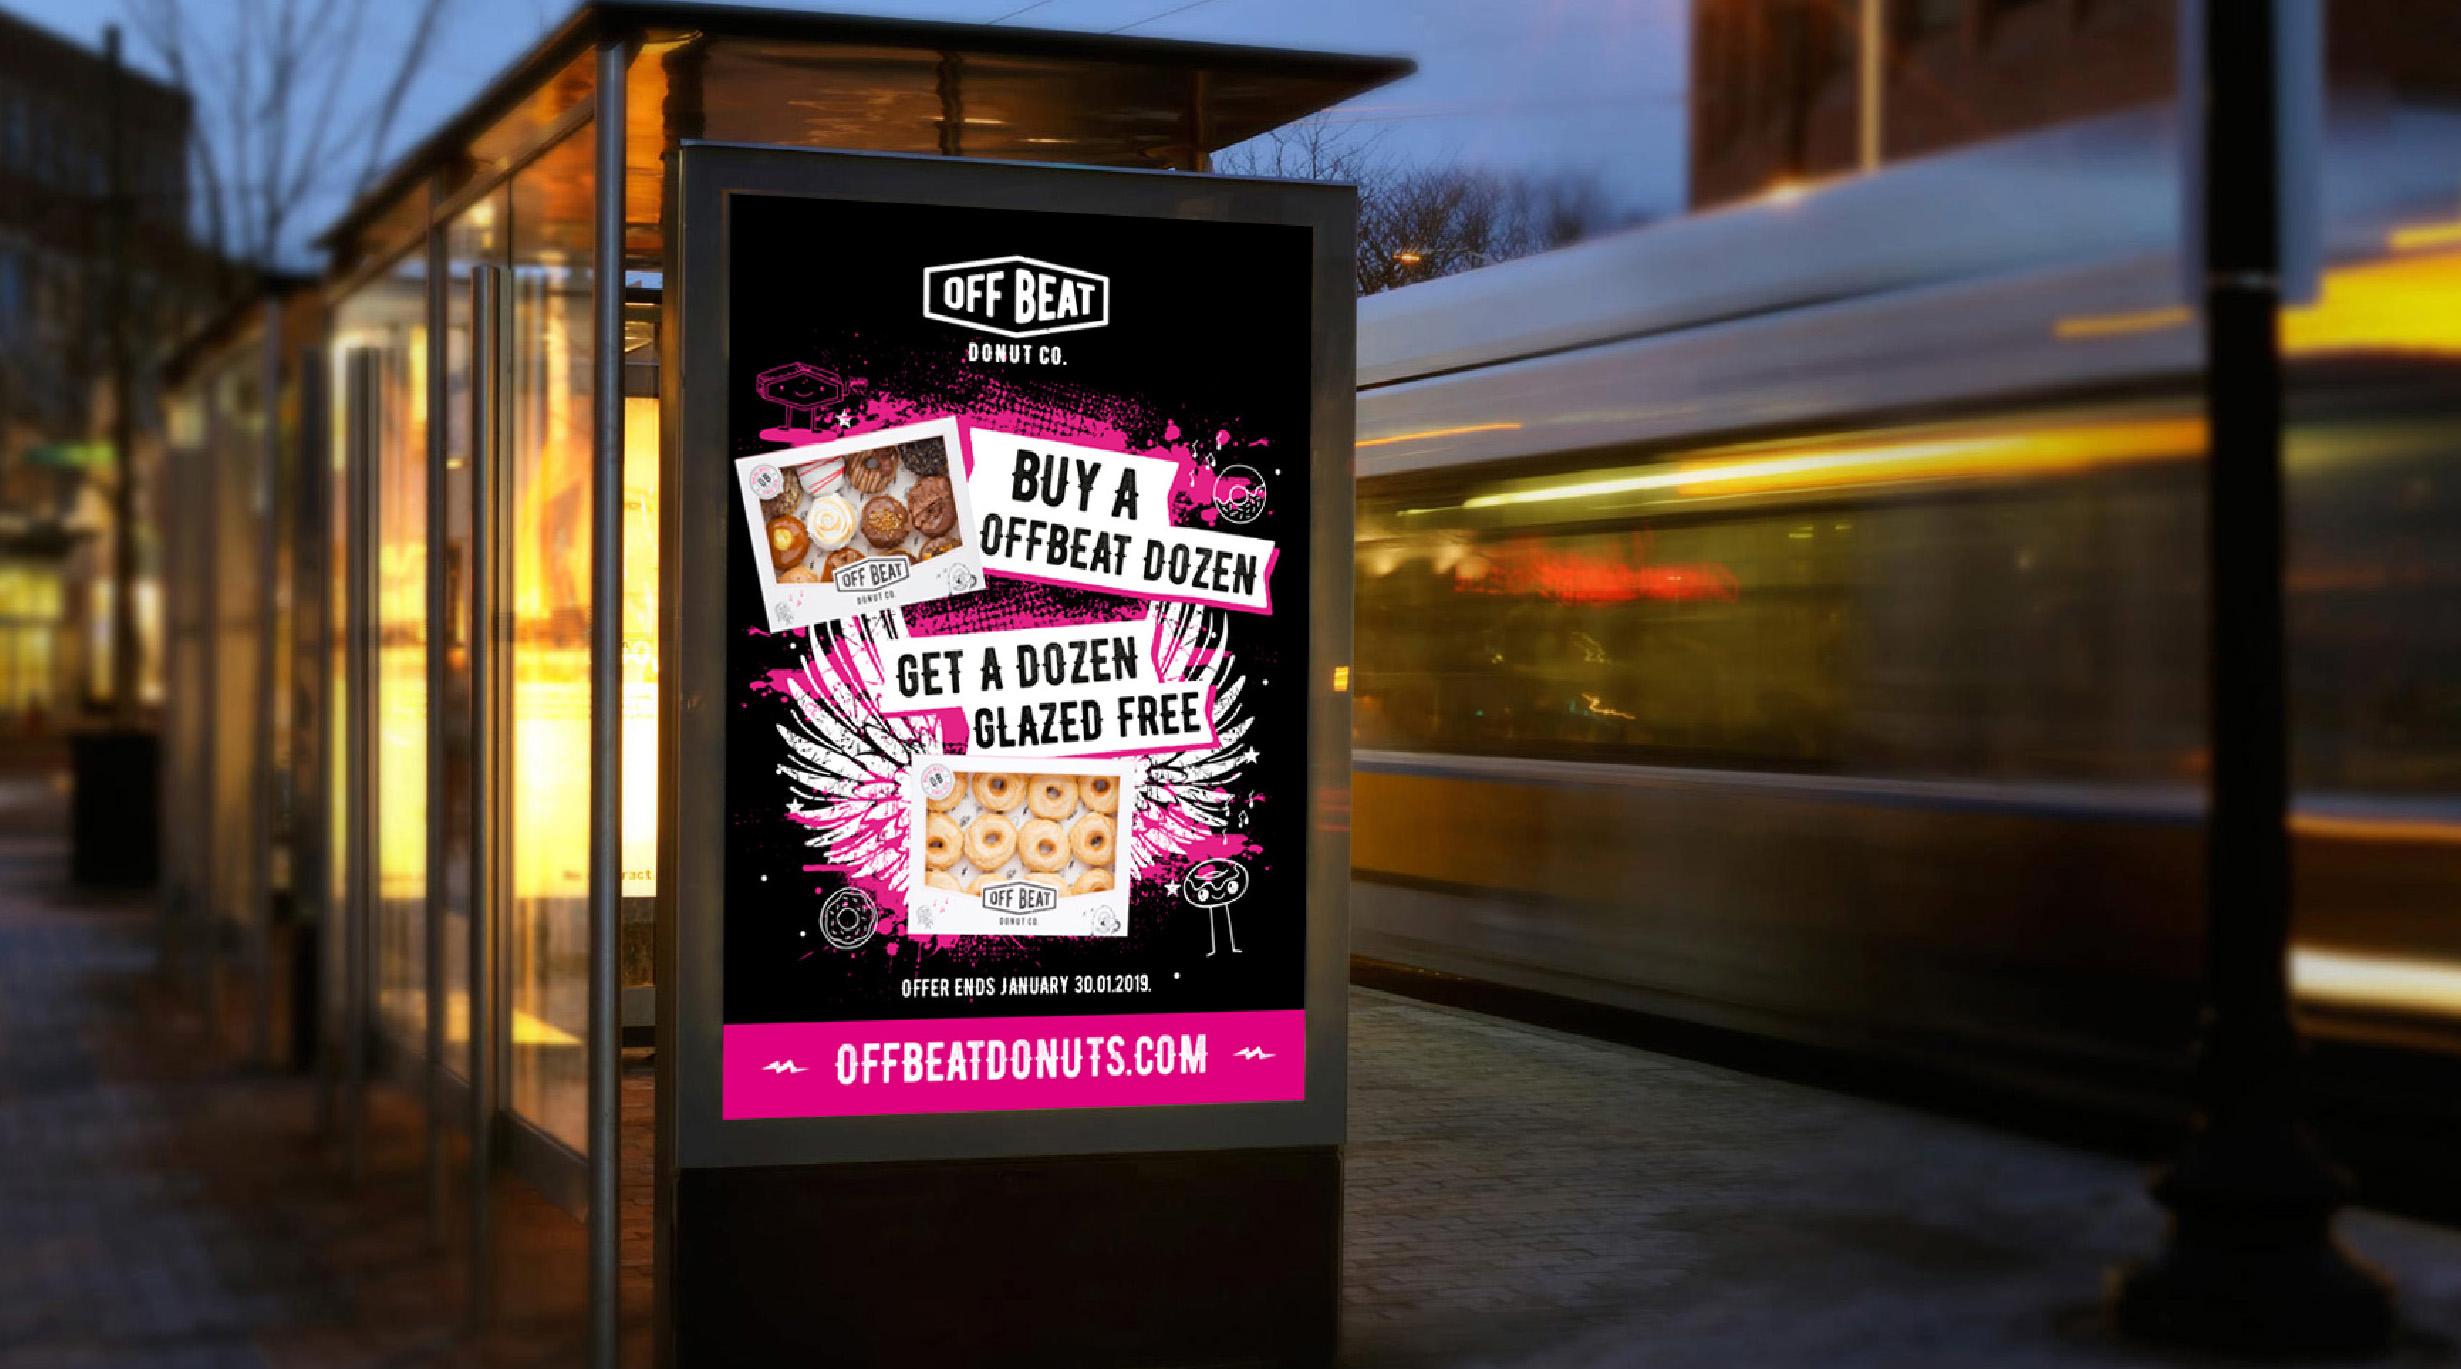 Offbeat Donut Advert.jpg